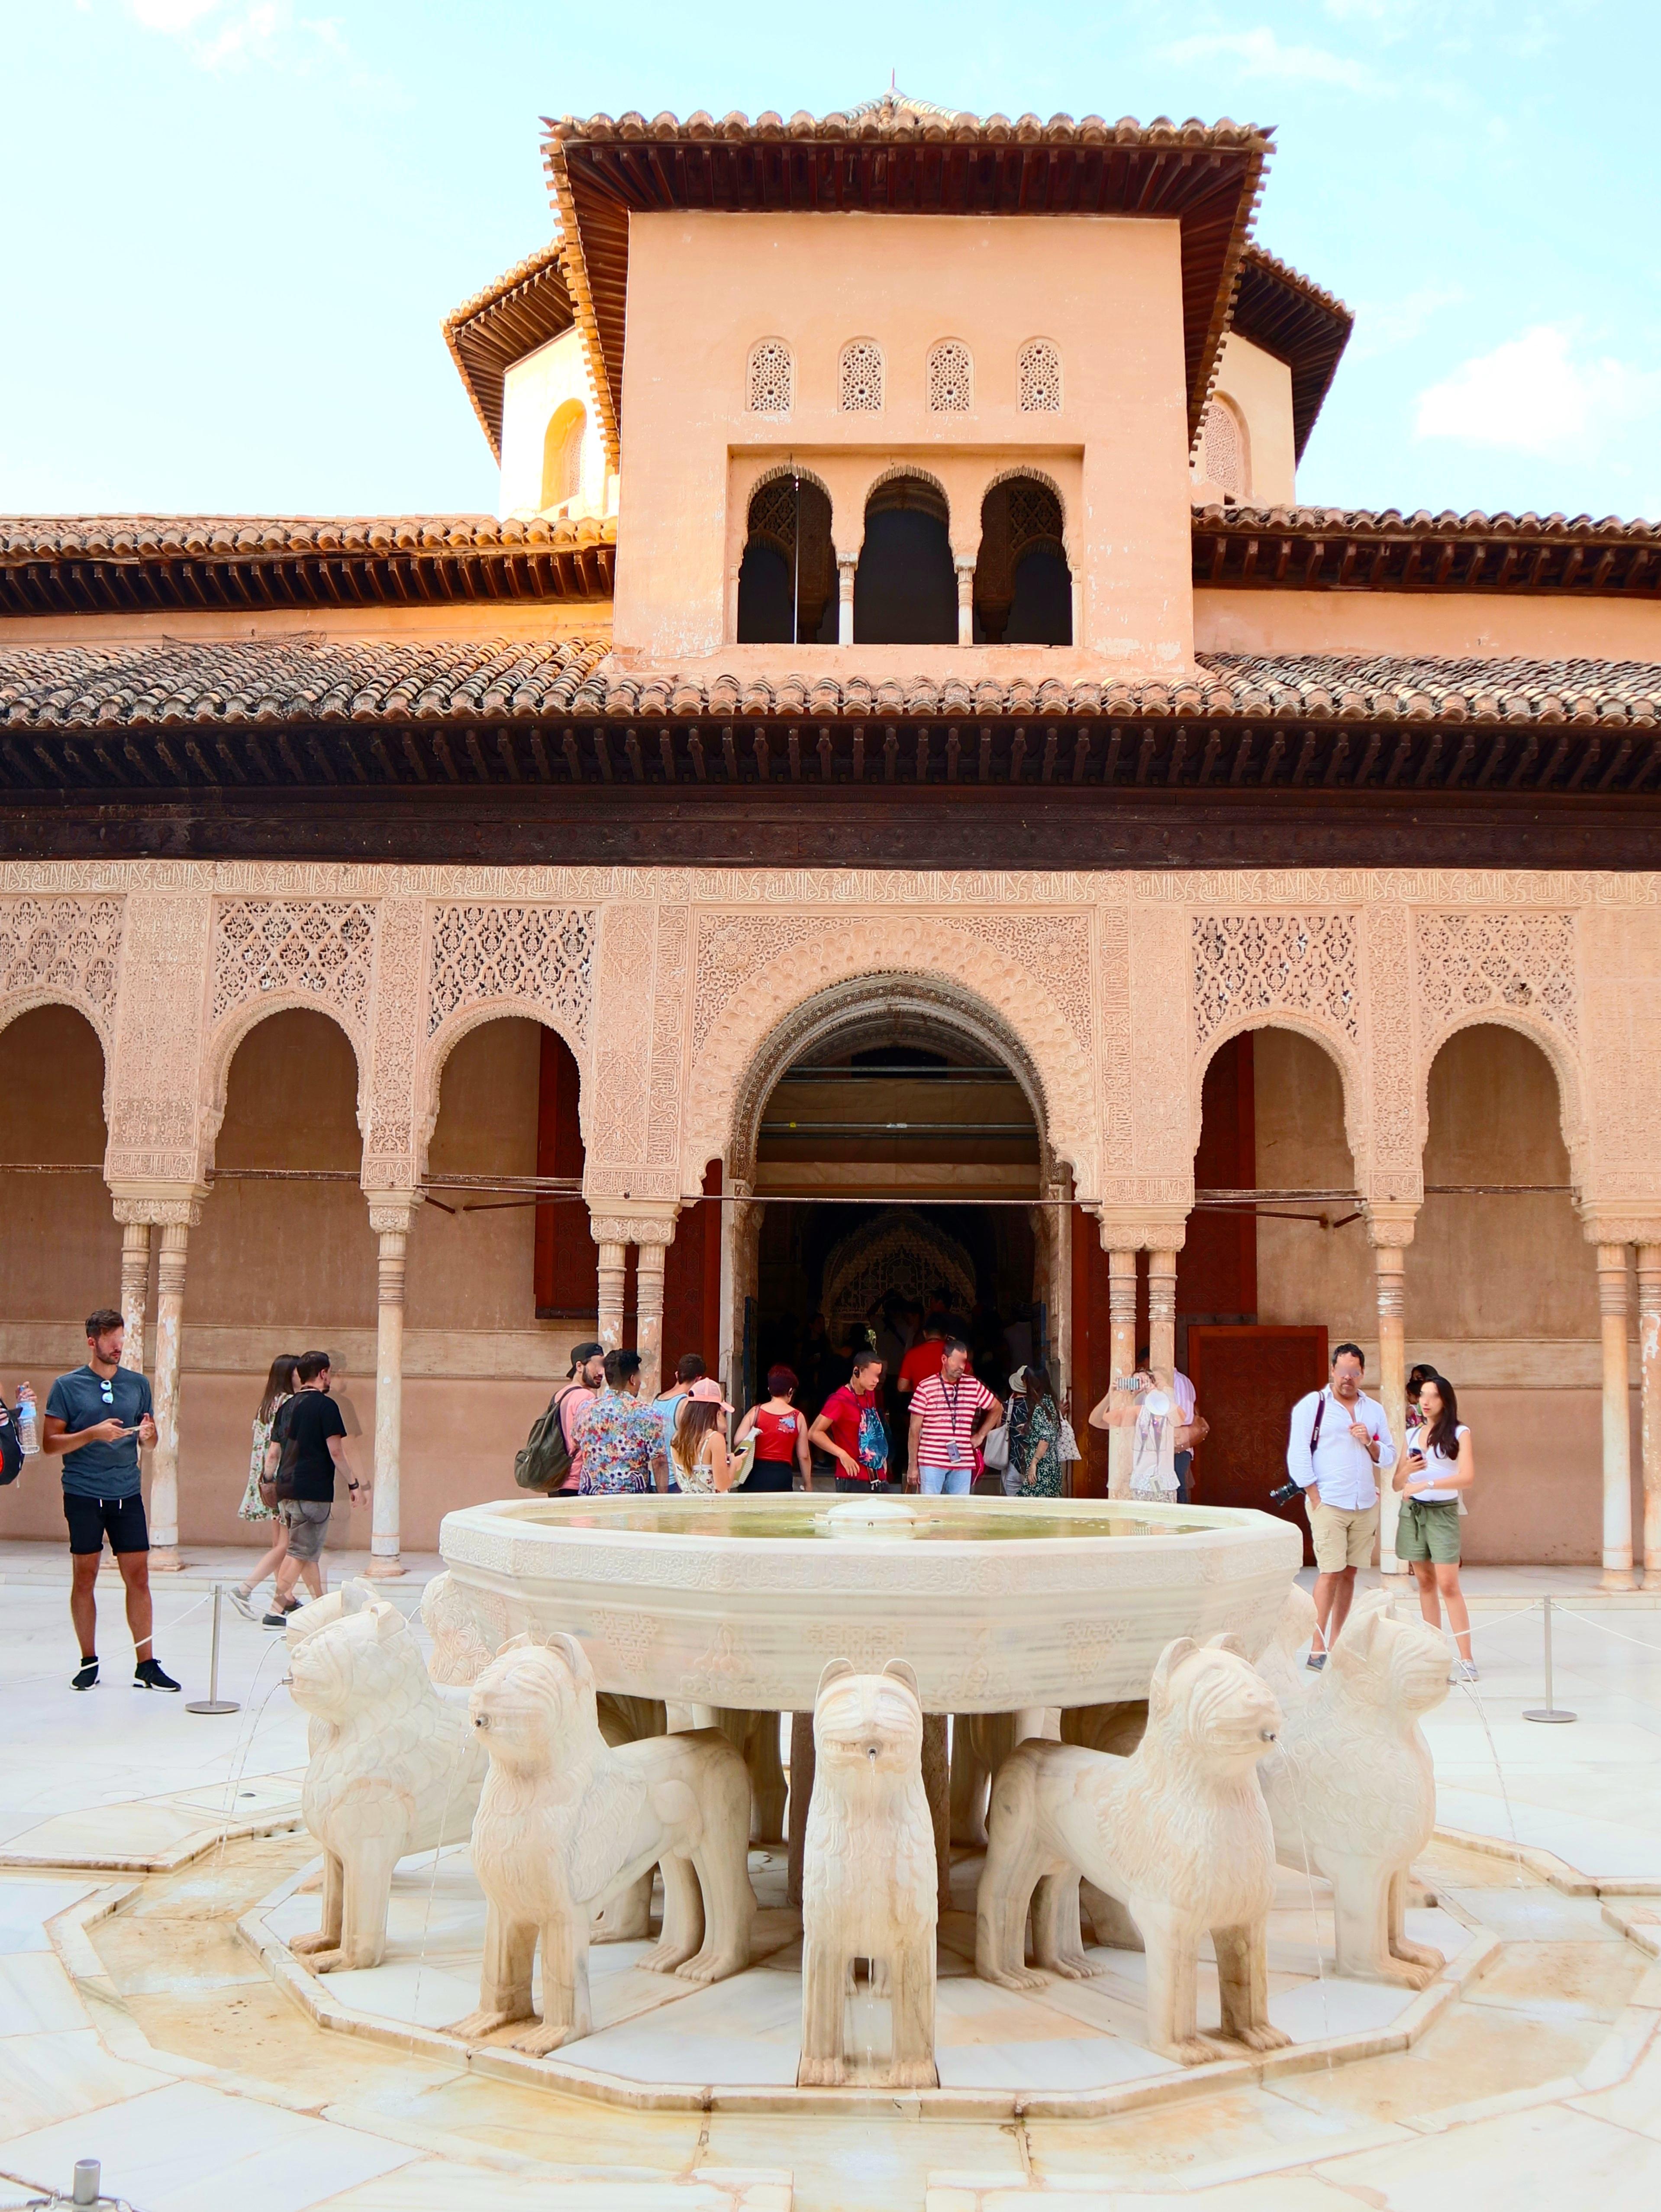 "Granada_Alhambra_PatiodeLosLeones_001"""""